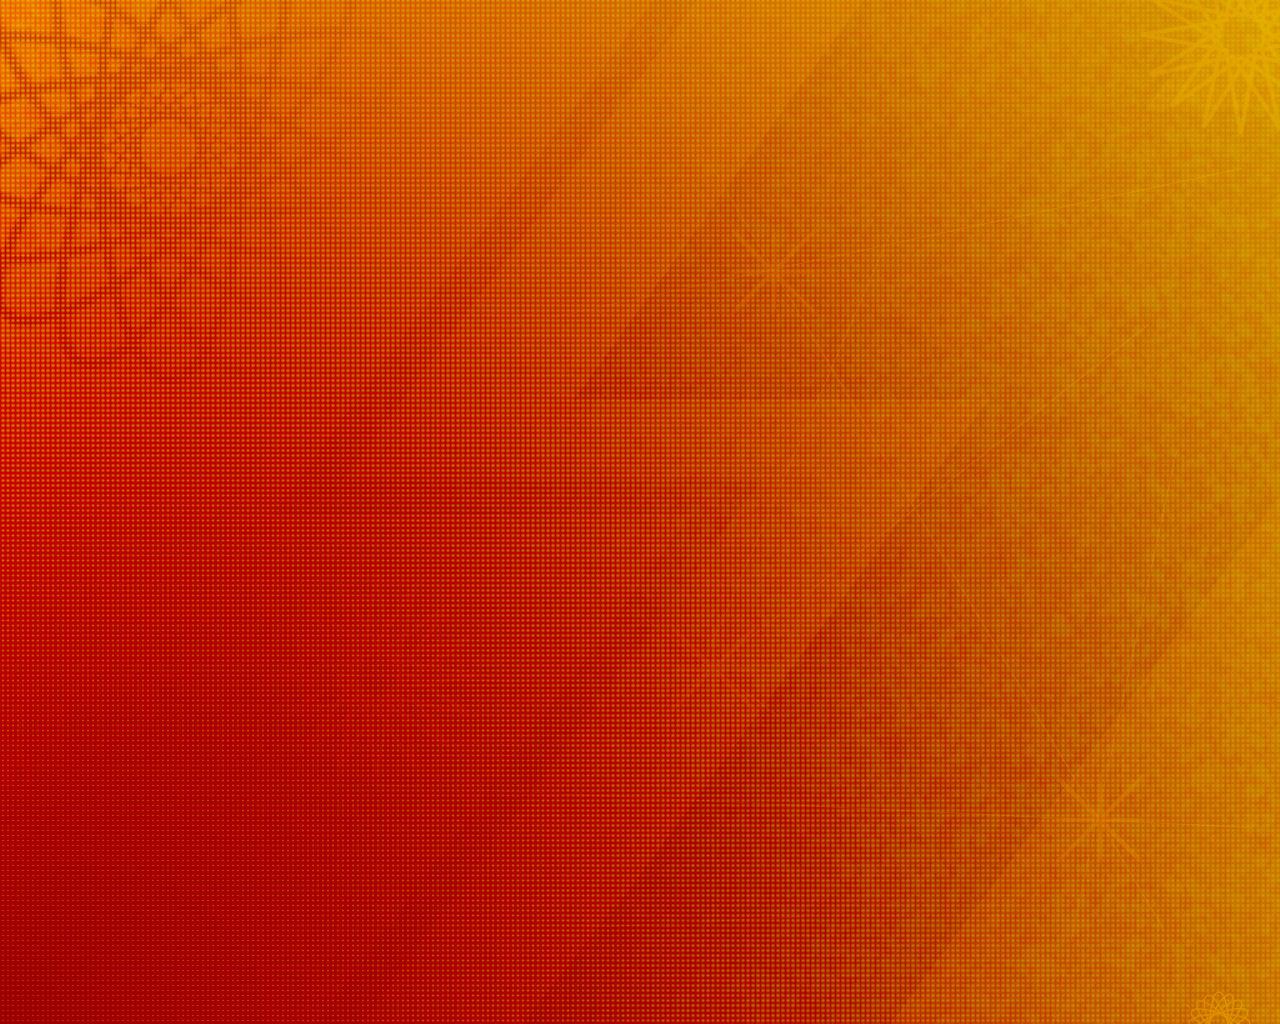 wall orange 0006.jpg